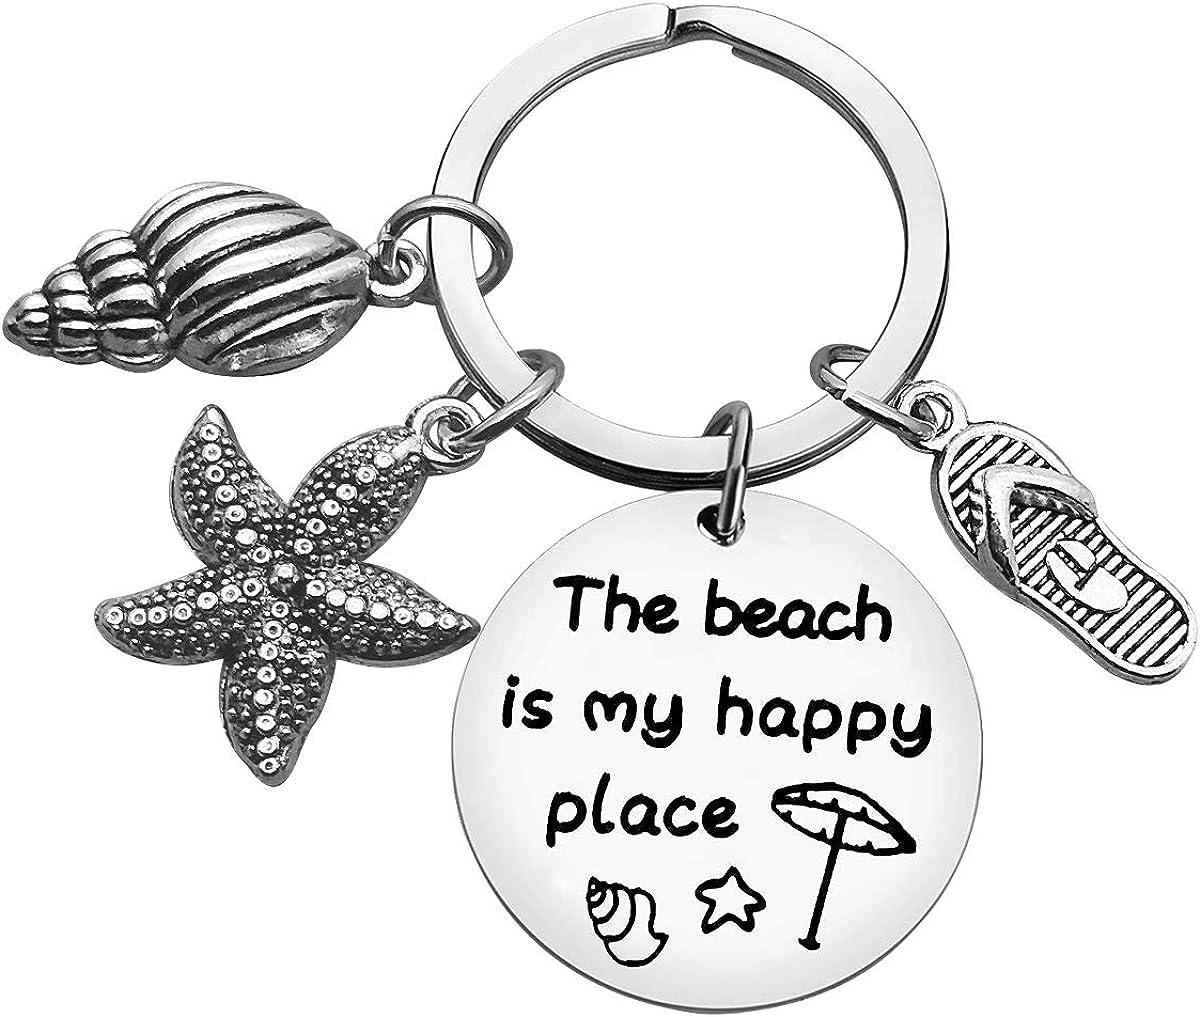 Beach Lover Gift Keychain Beach Jewelry Summer Vacation Gift Beach Charm Keychain Vacation Gift Birthday Christmas Graduation Gift for Women Girl Teens Beach Lover